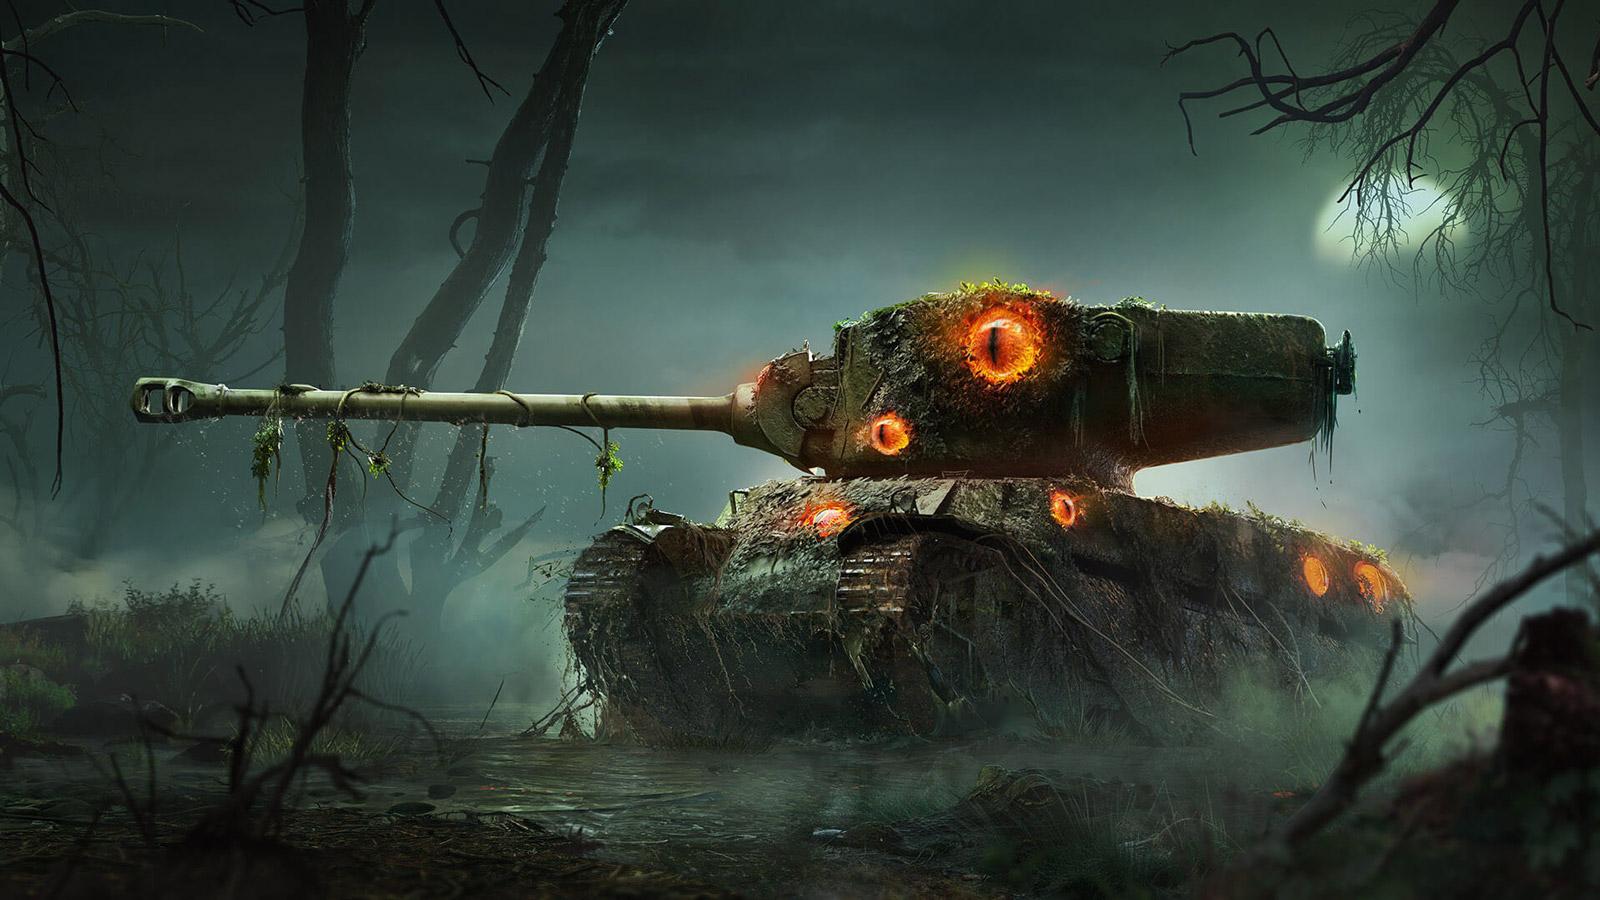 Free World of Tanks Wallpaper in 1600x900